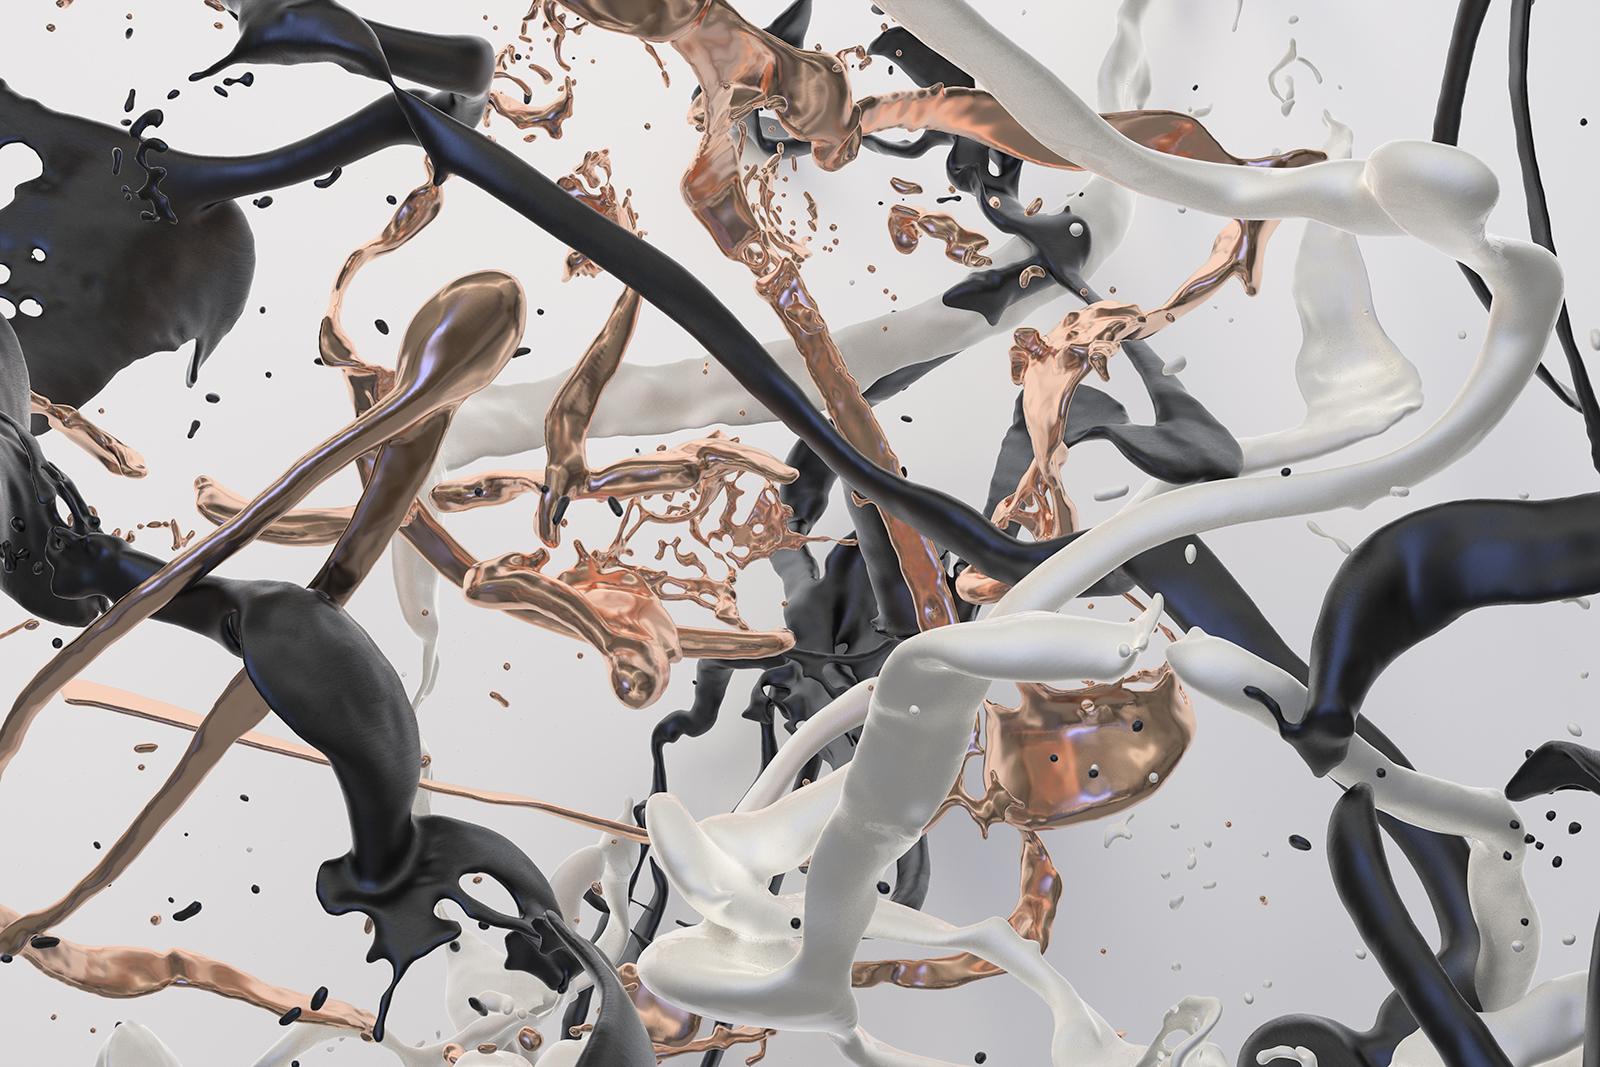 Bodypaint V 41, CGI Fine Art Print, 70 x 105 cm, 2020